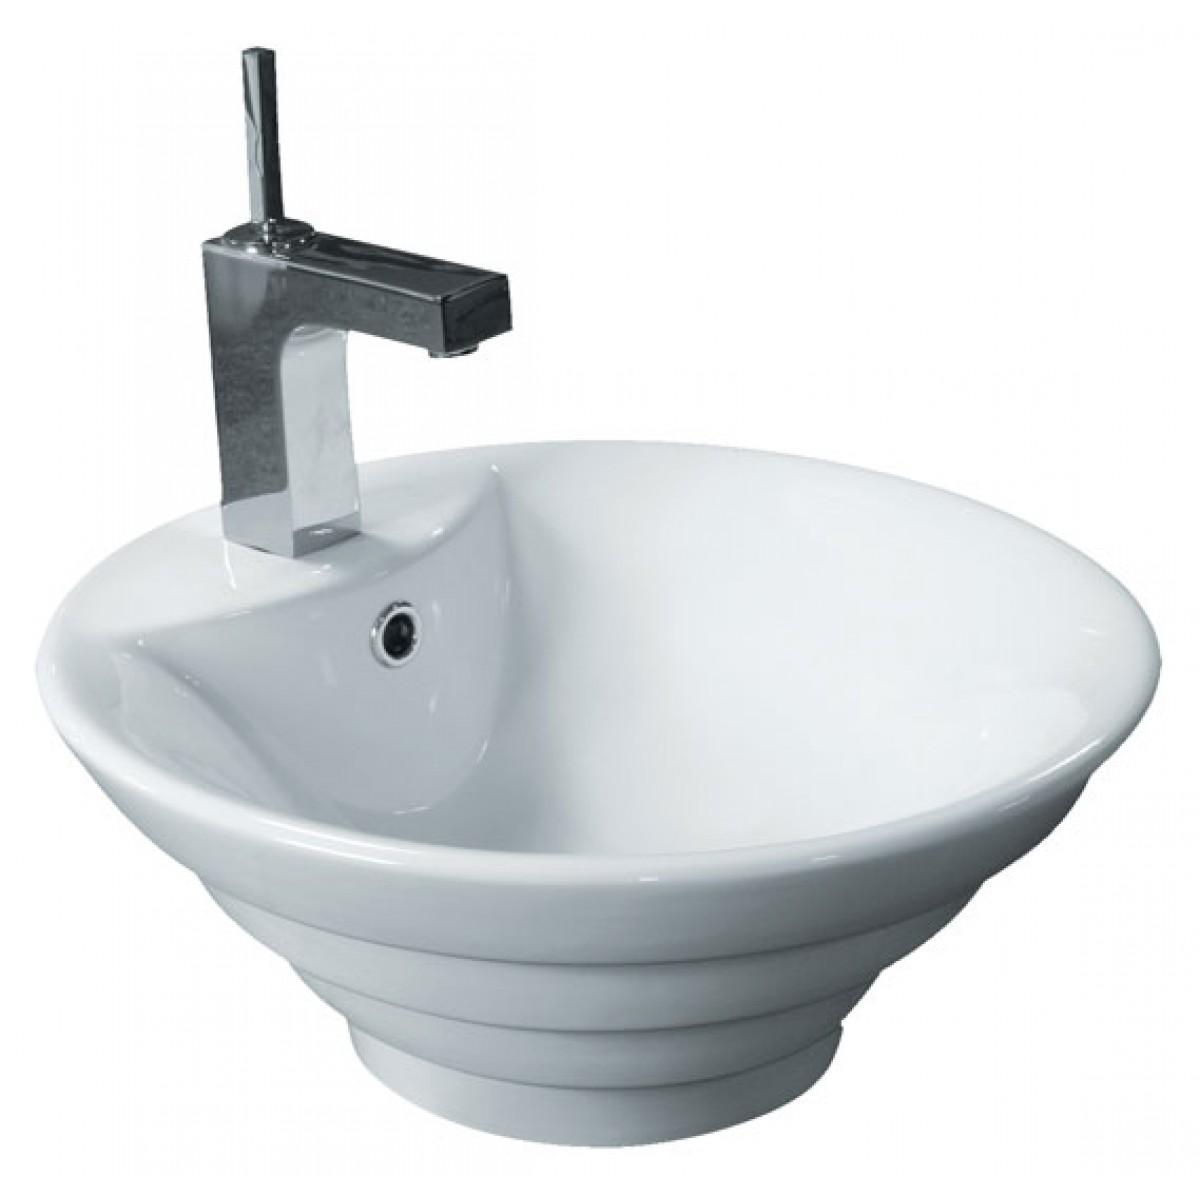 Sink Countertop Bathroom: Porcelain Ceramic Single Hole Countertop Bathroom Vessel